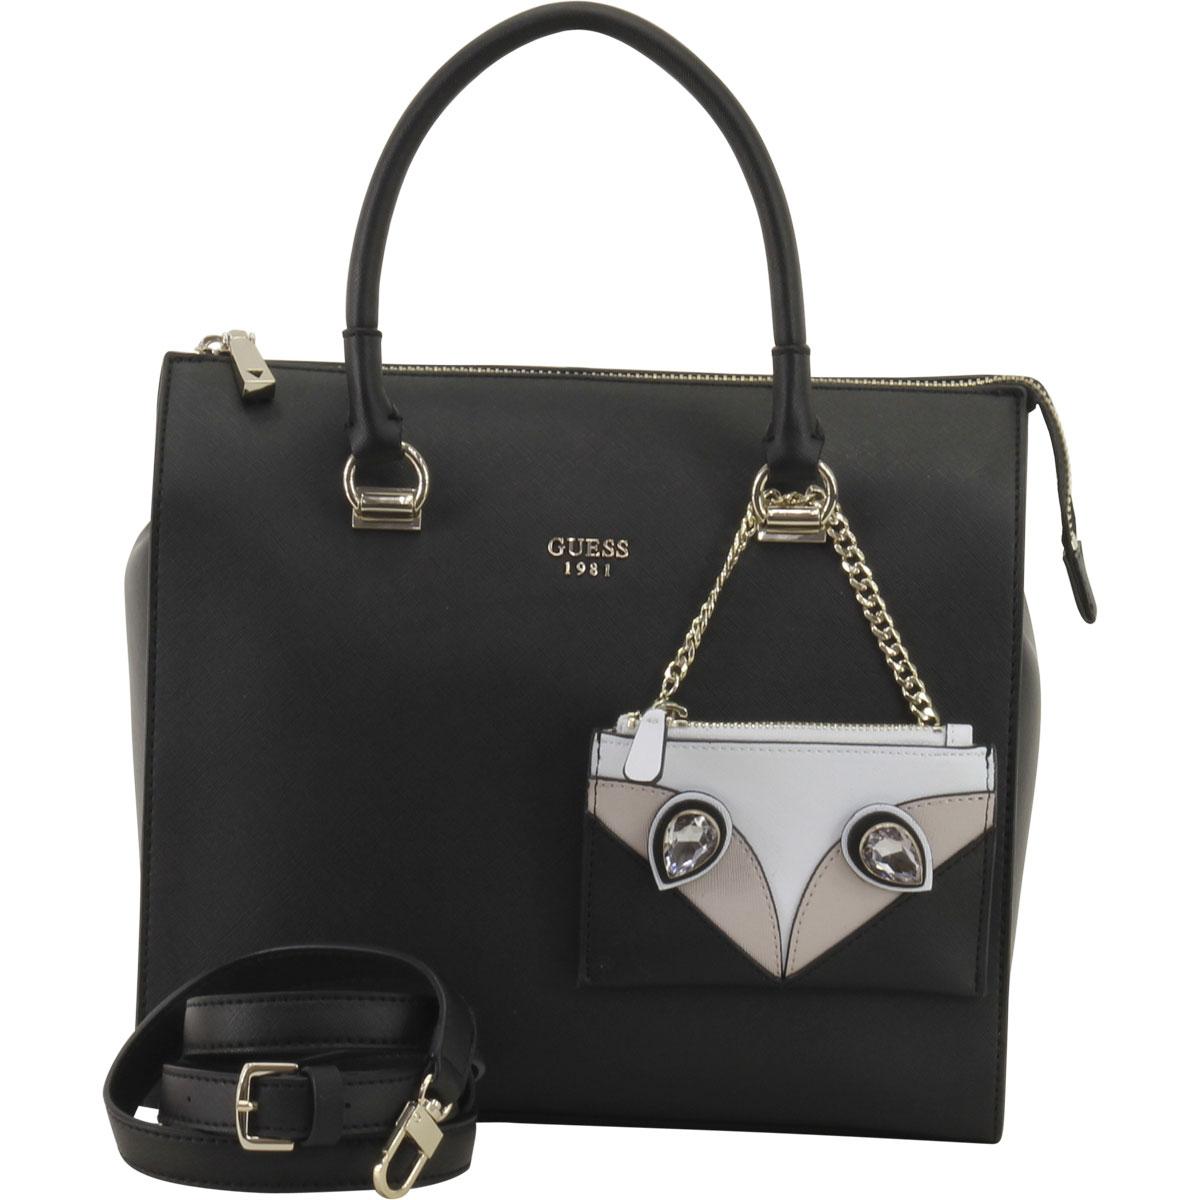 Guess Women s Kizzy Black Box Satchel Handbag 885935998963  717d0b1425156